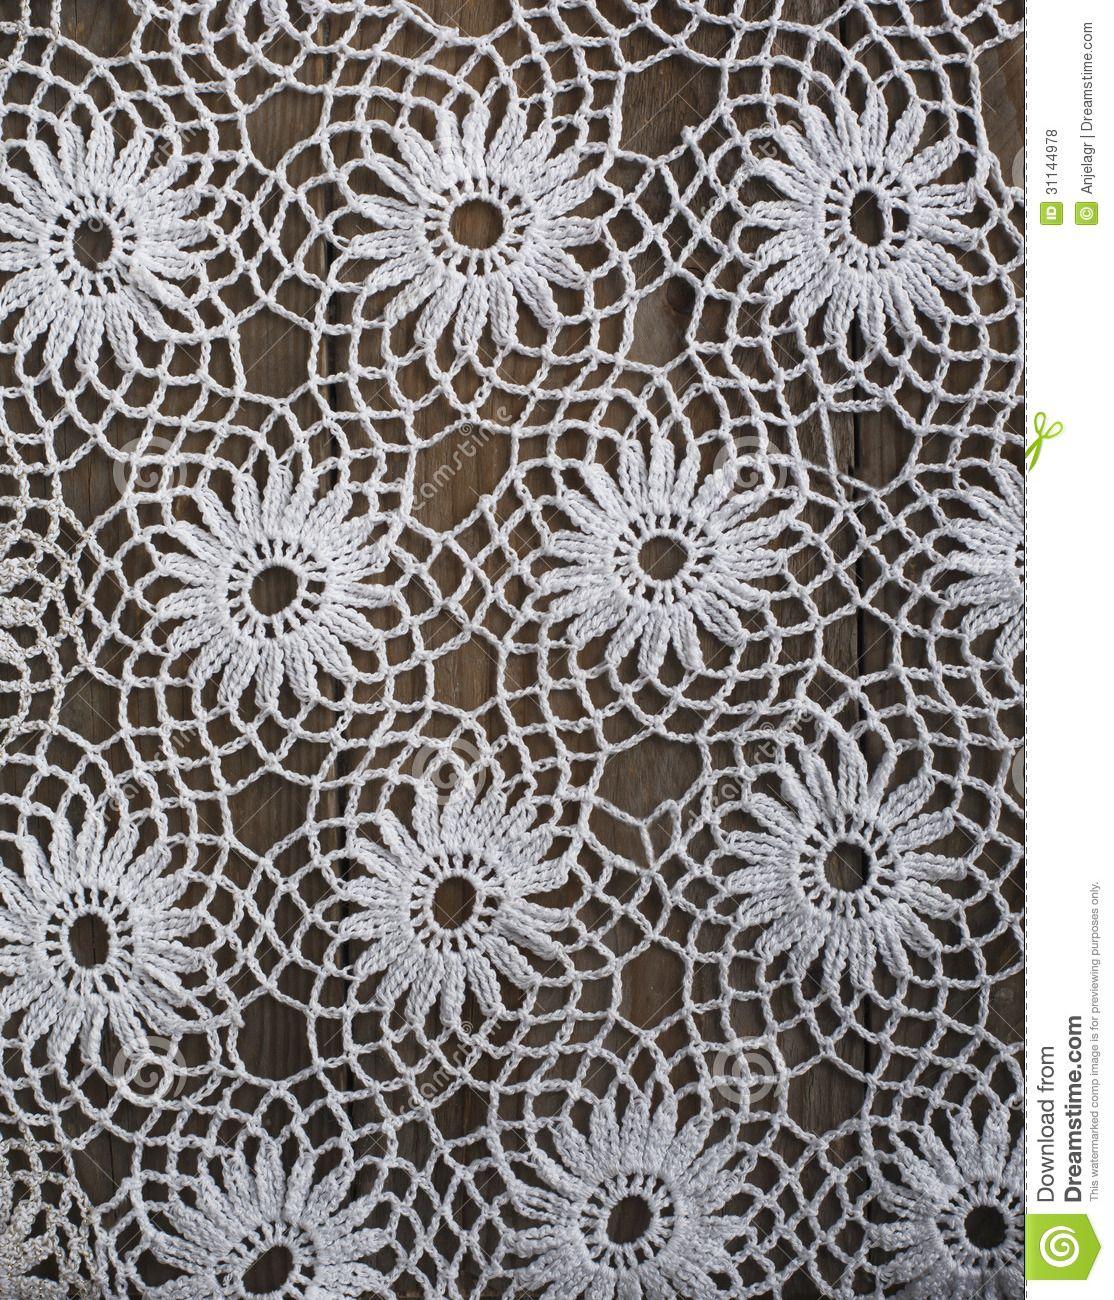 handmade-crochet-tablecloth-pattern-background-31144978.jpg (1114 ...